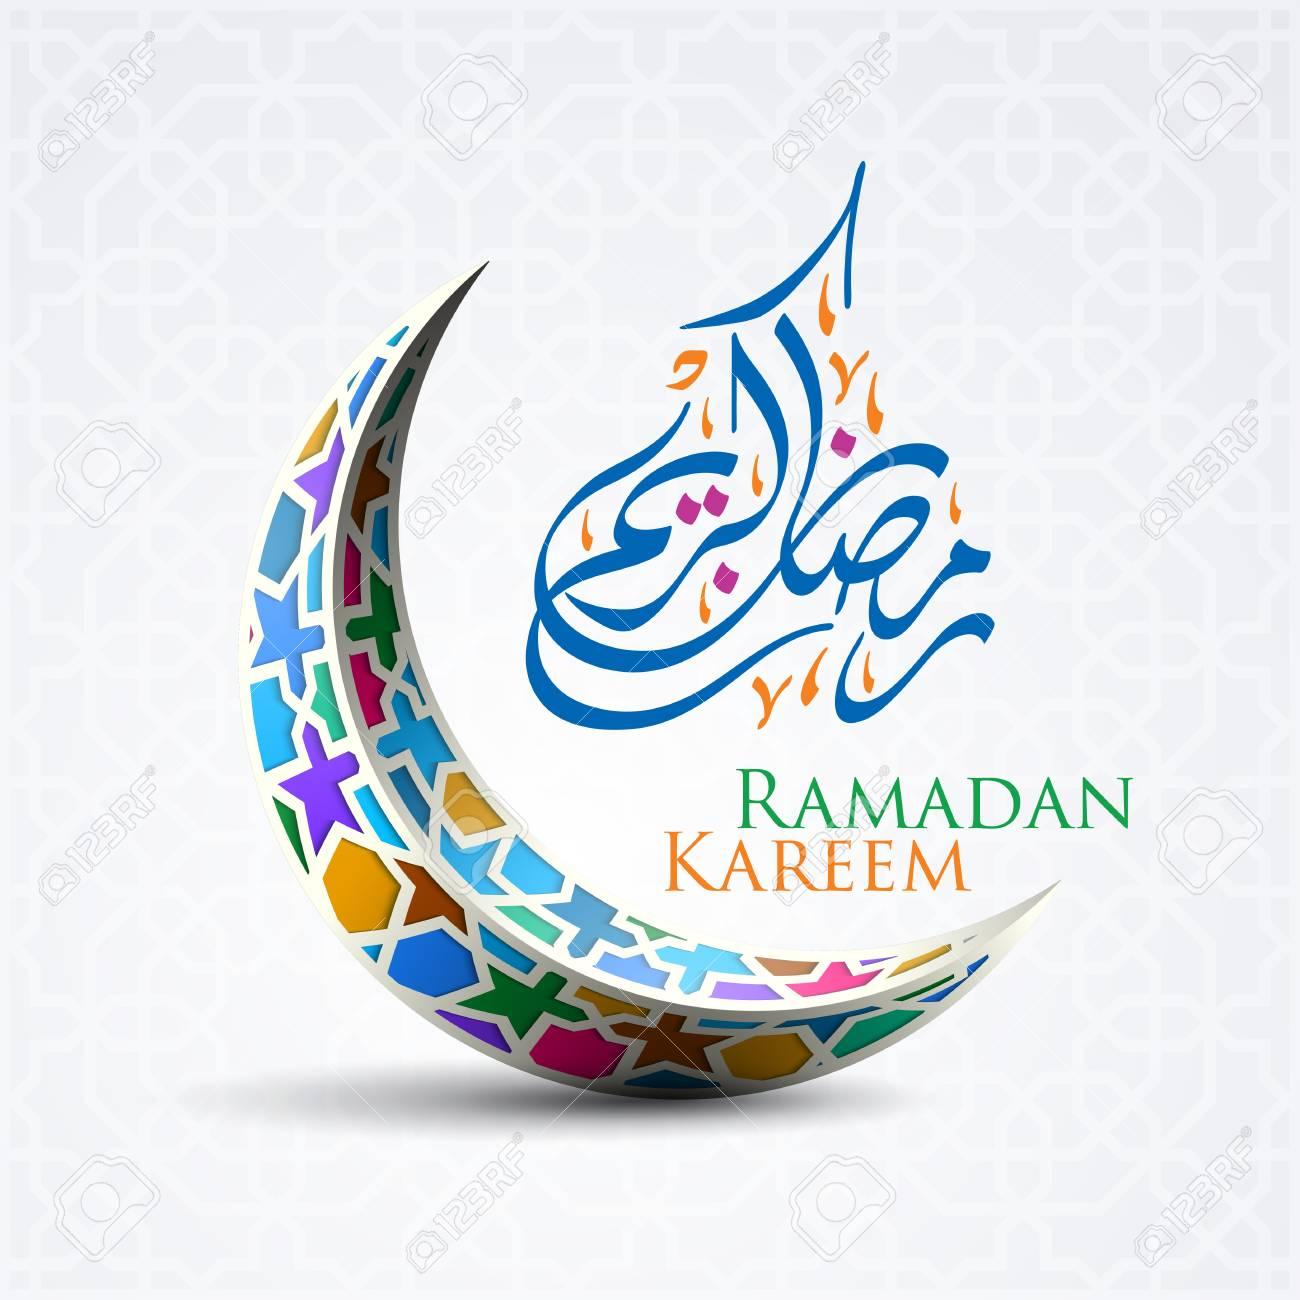 Ramadan kareem islamic crescent and arabic calligraphy vector illustration - 106704207